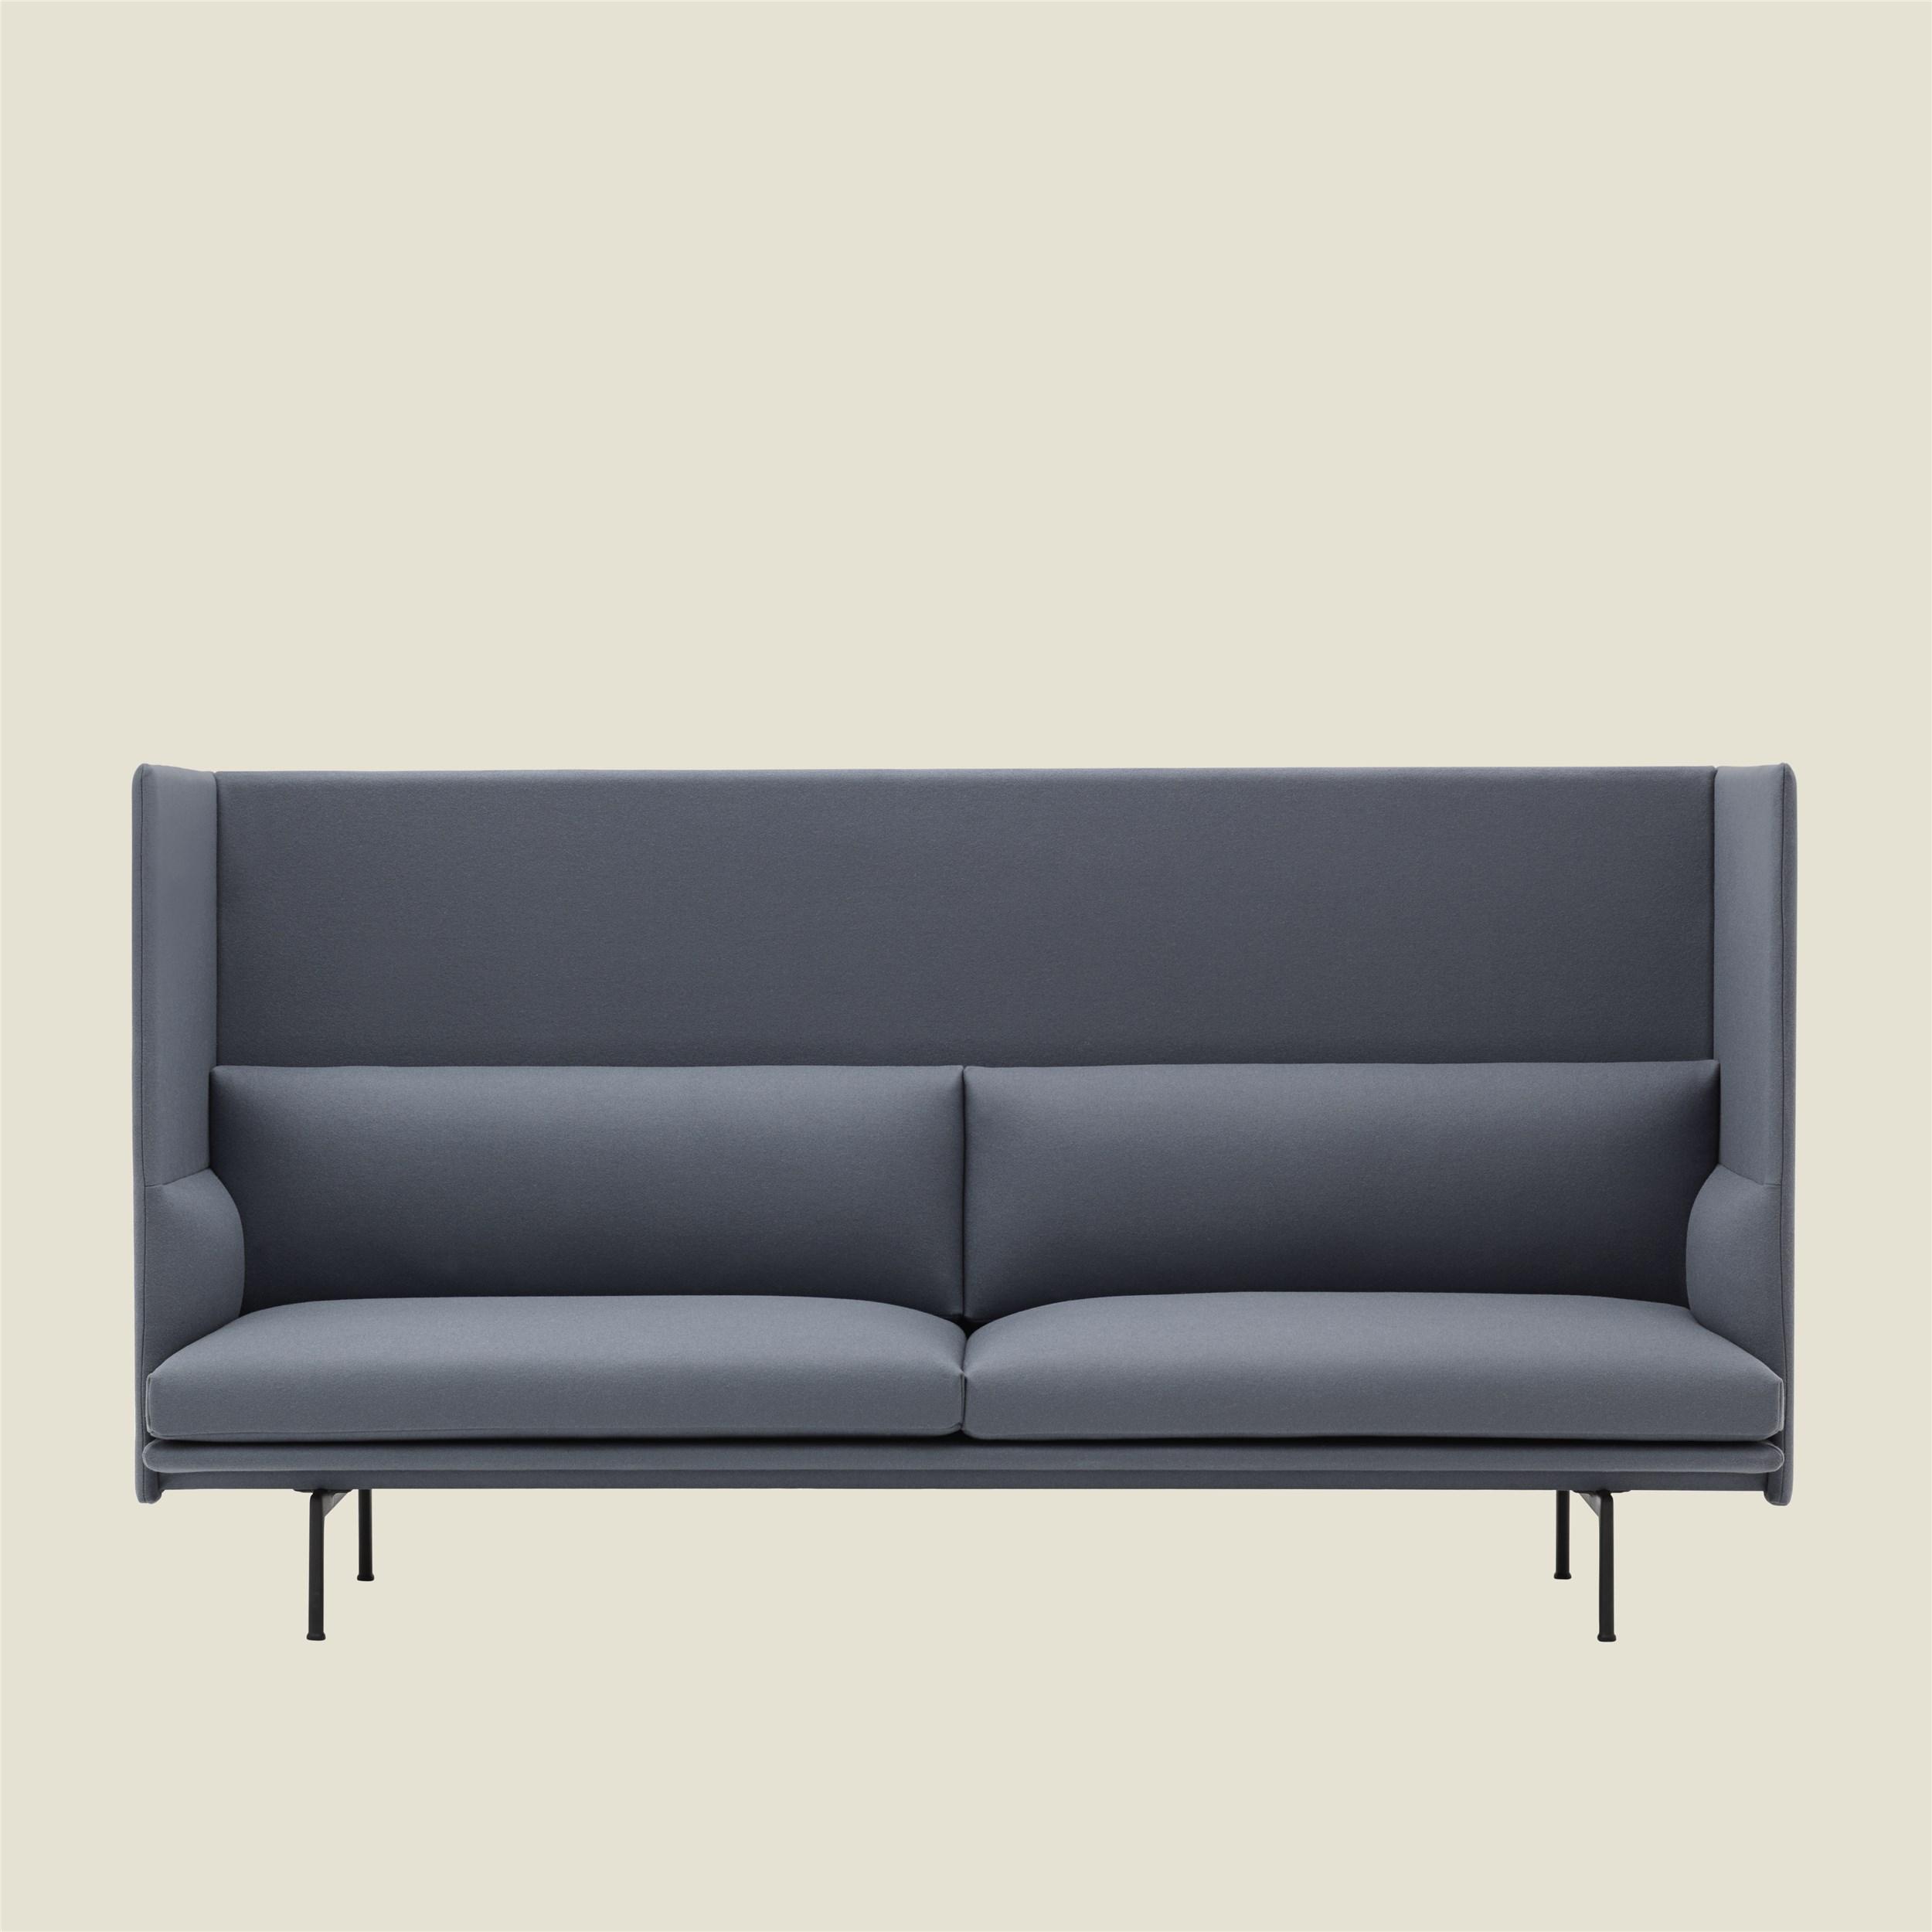 Outline high back 3 seater, Muuto sofa, modern furniture, scandinavian design, interiors.jpg